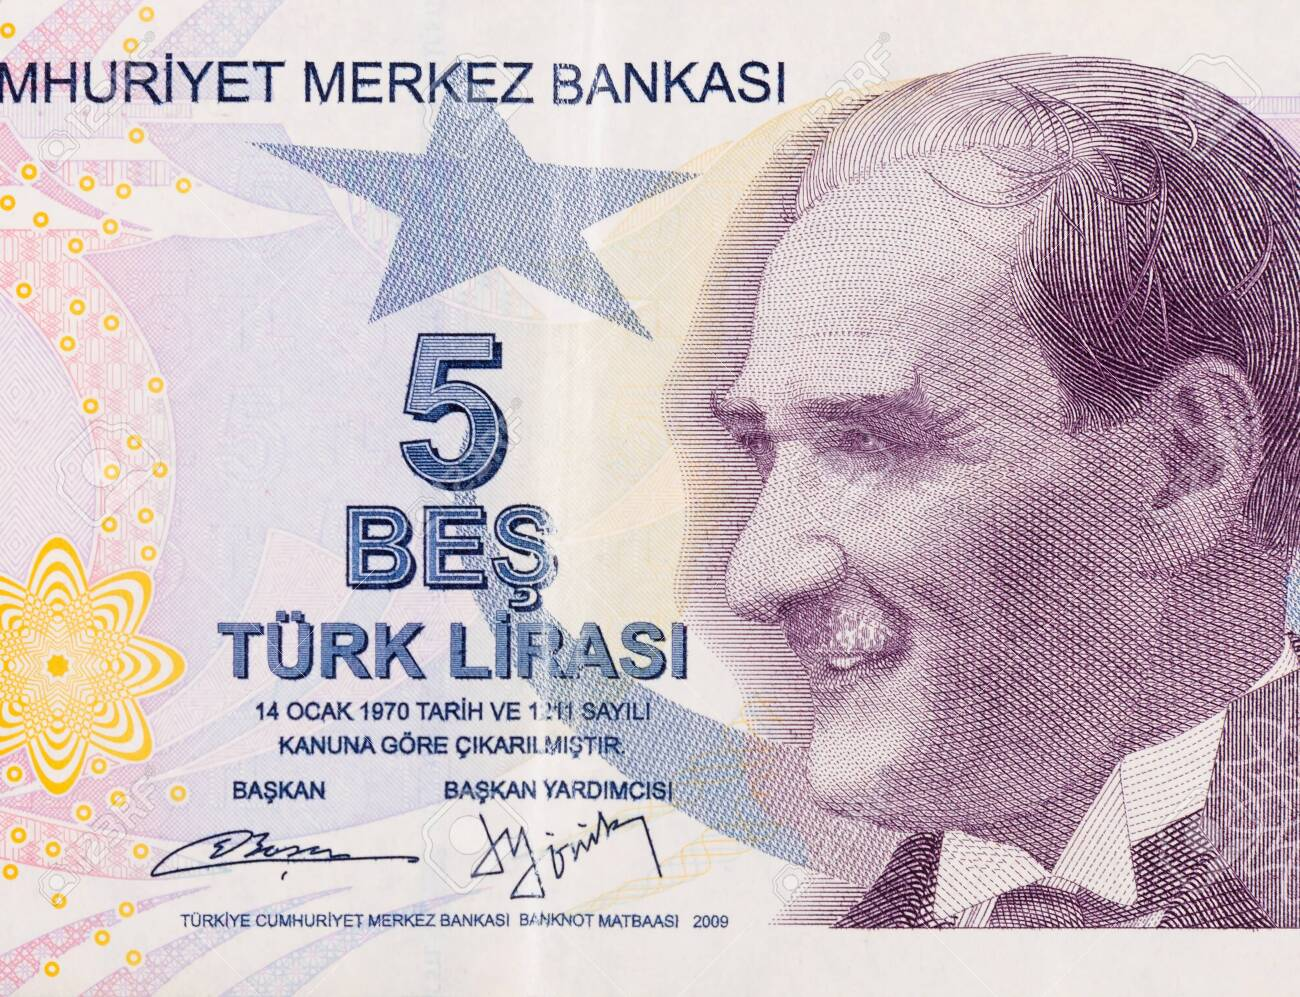 President Mustafa Kemal Ataturk Portrait from Turkey 5 Lira 2009 Banknotes close up fragment - 138431484